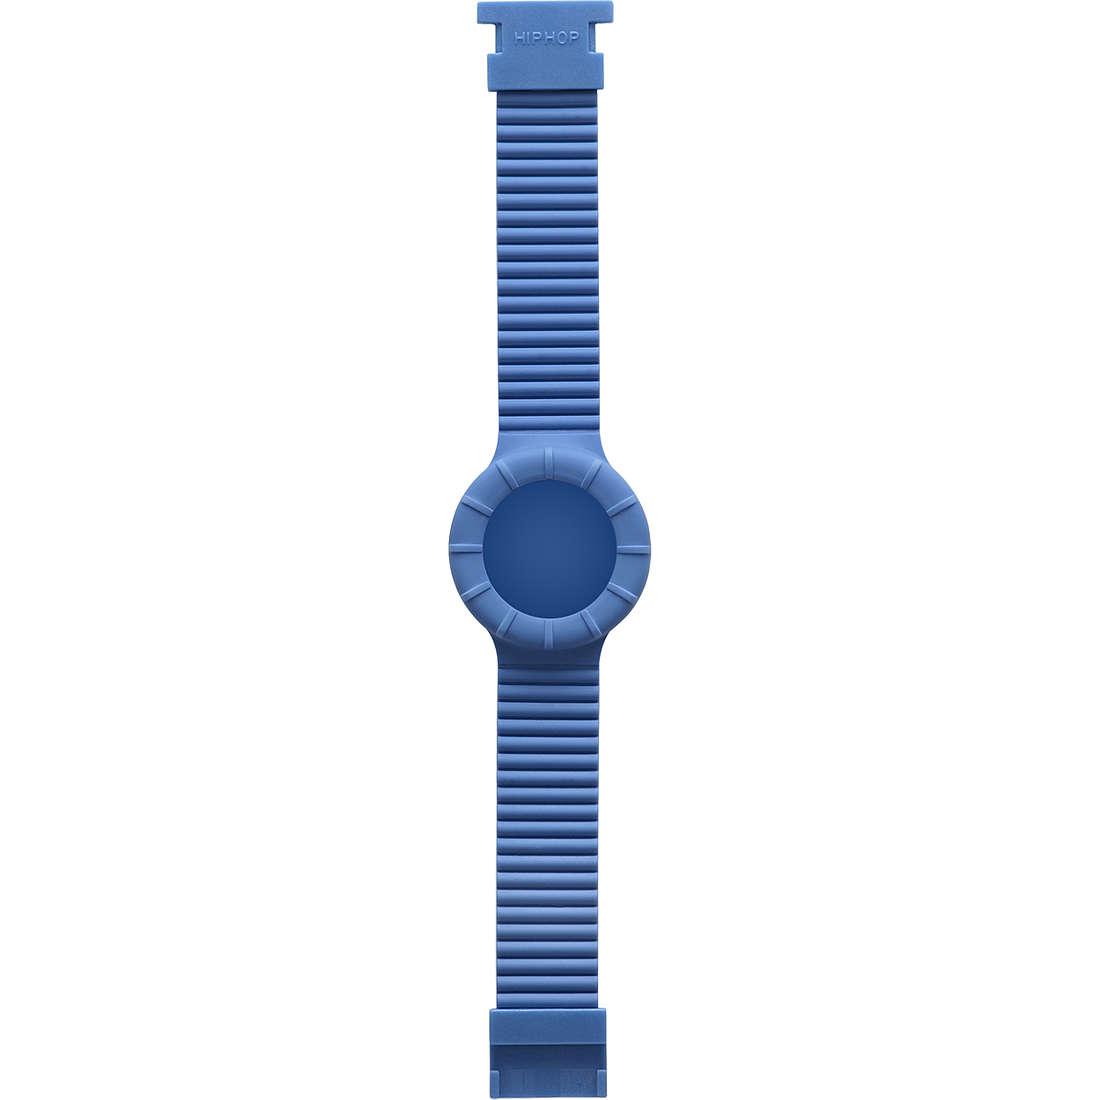 orologio accessorio unisex Hip Hop HBU0088